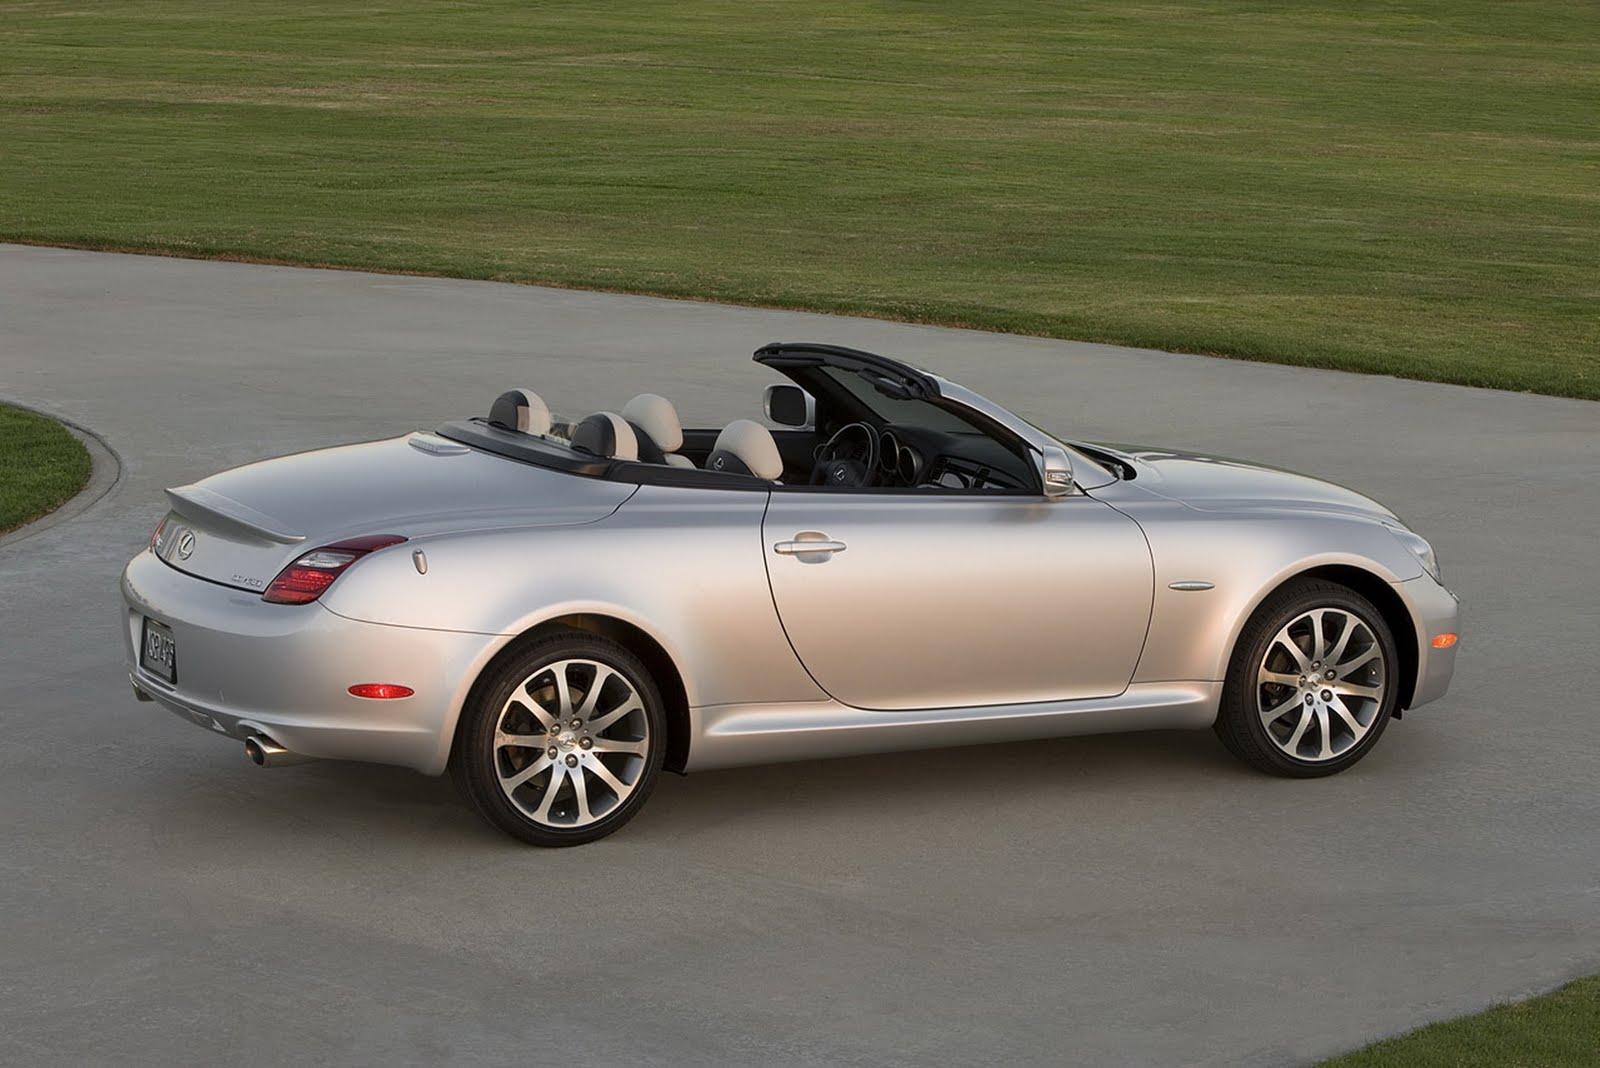 http://1.bp.blogspot.com/-7j02D3BuCsA/TaiEWLqcz9I/AAAAAAAACB8/zGk6ToXEWjA/s1600/Lexus-SC430-Pebble-Beach-Edition-quality.jpg